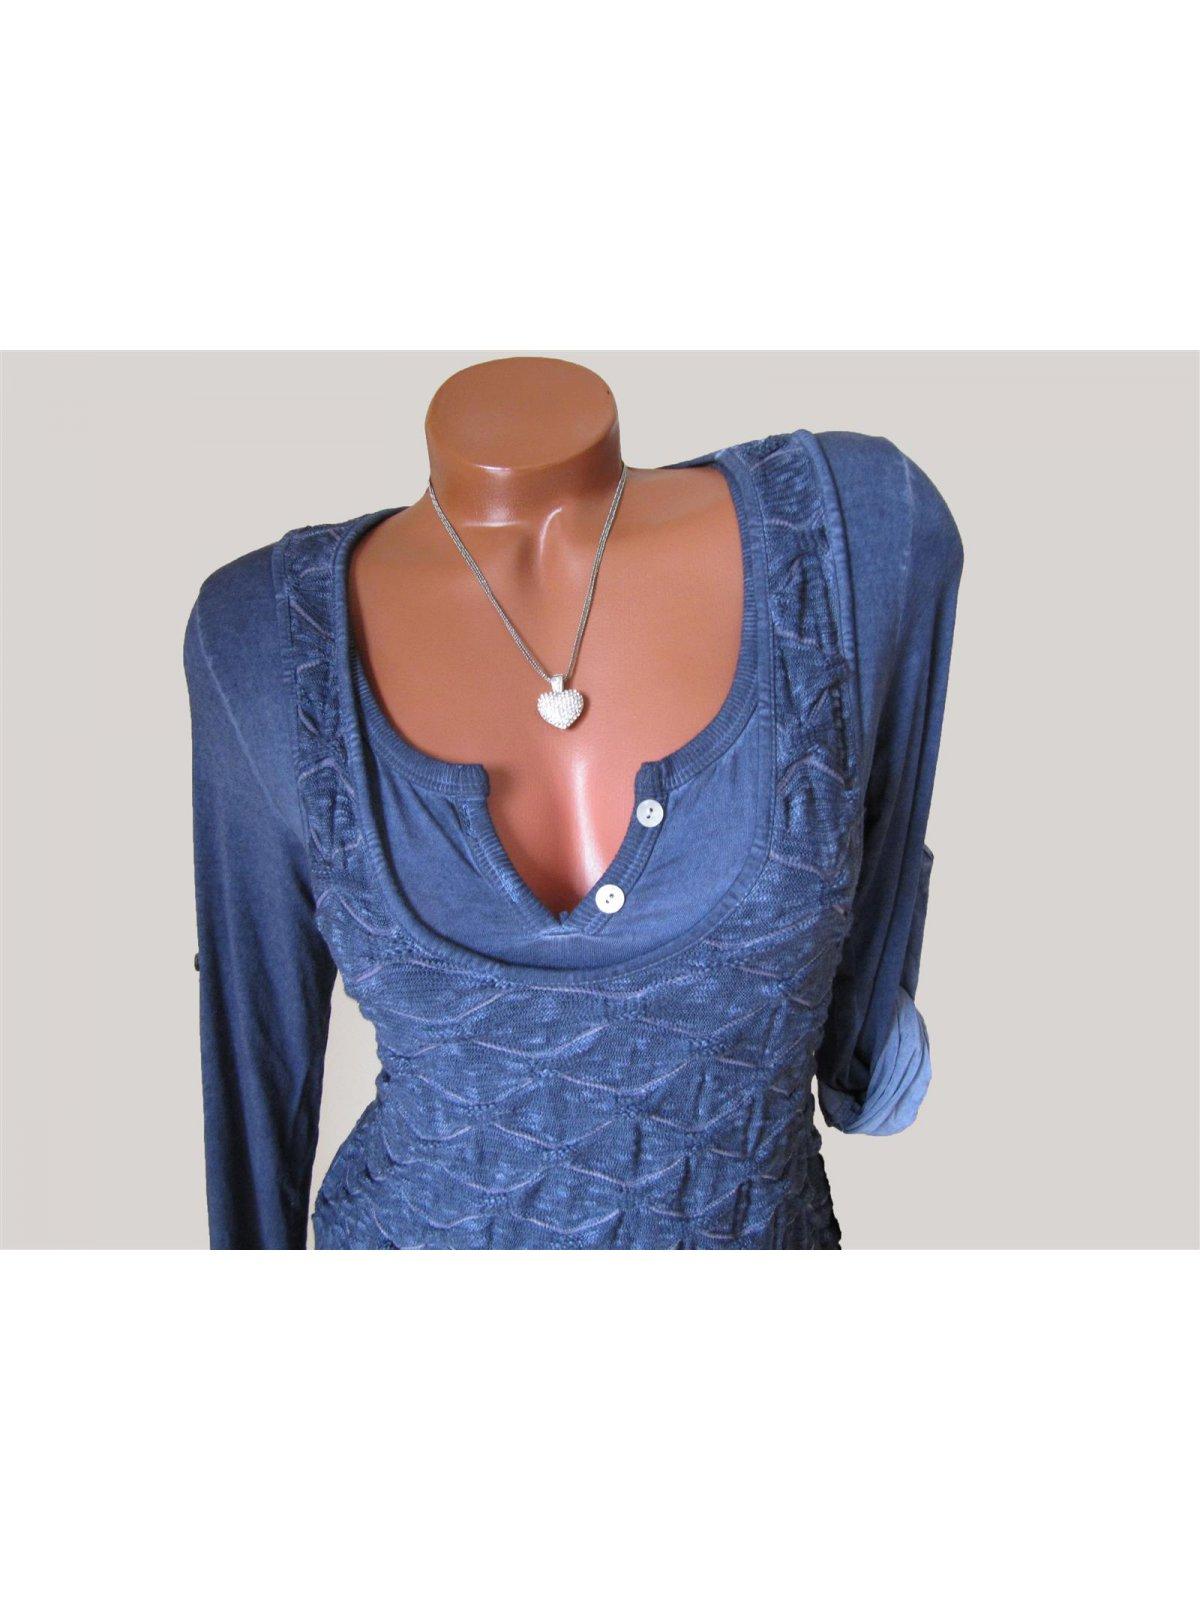 Strick Tunika Kleid Muster meliert Volant Shirt 30% Seide ...